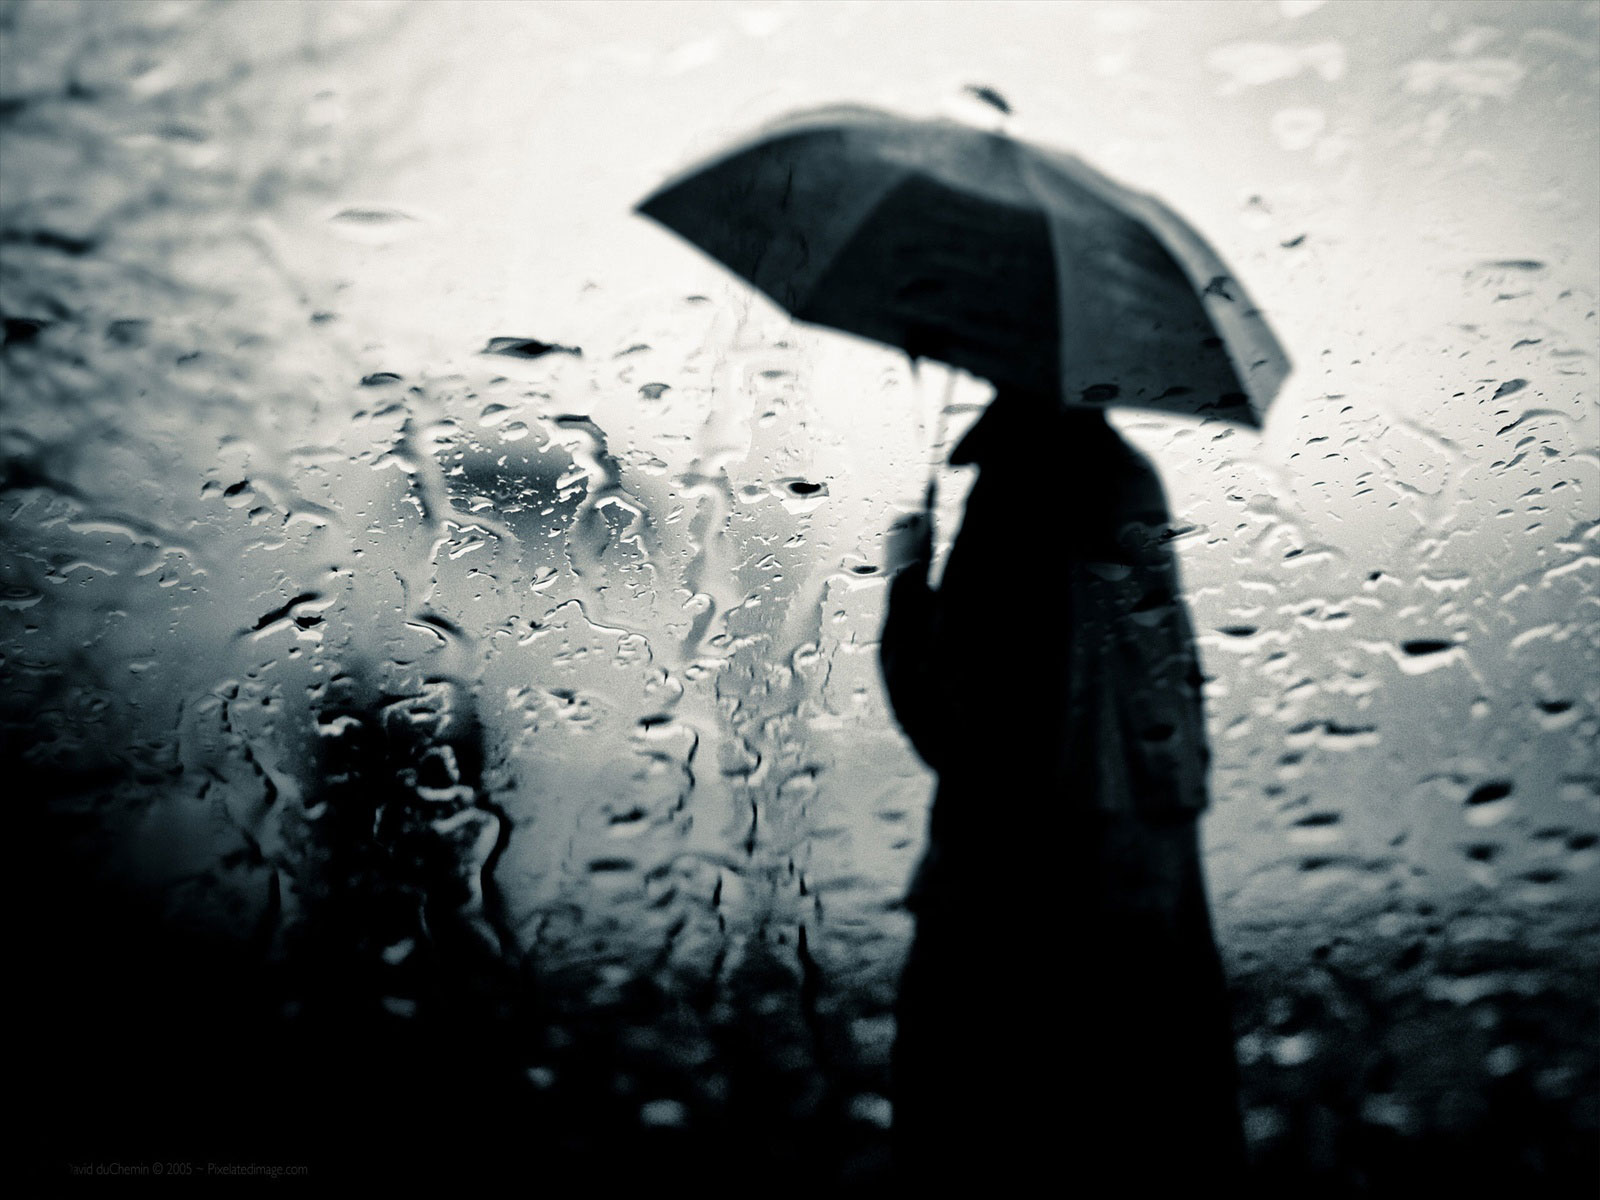 http://4.bp.blogspot.com/-WxShX2nAfHE/T-lnwuGkkSI/AAAAAAAAASI/jG1OE4IQT4k/s1600/Mirror-Downlood-free-rain-wallpaper%2Bfor%2Bdesktop.jpg